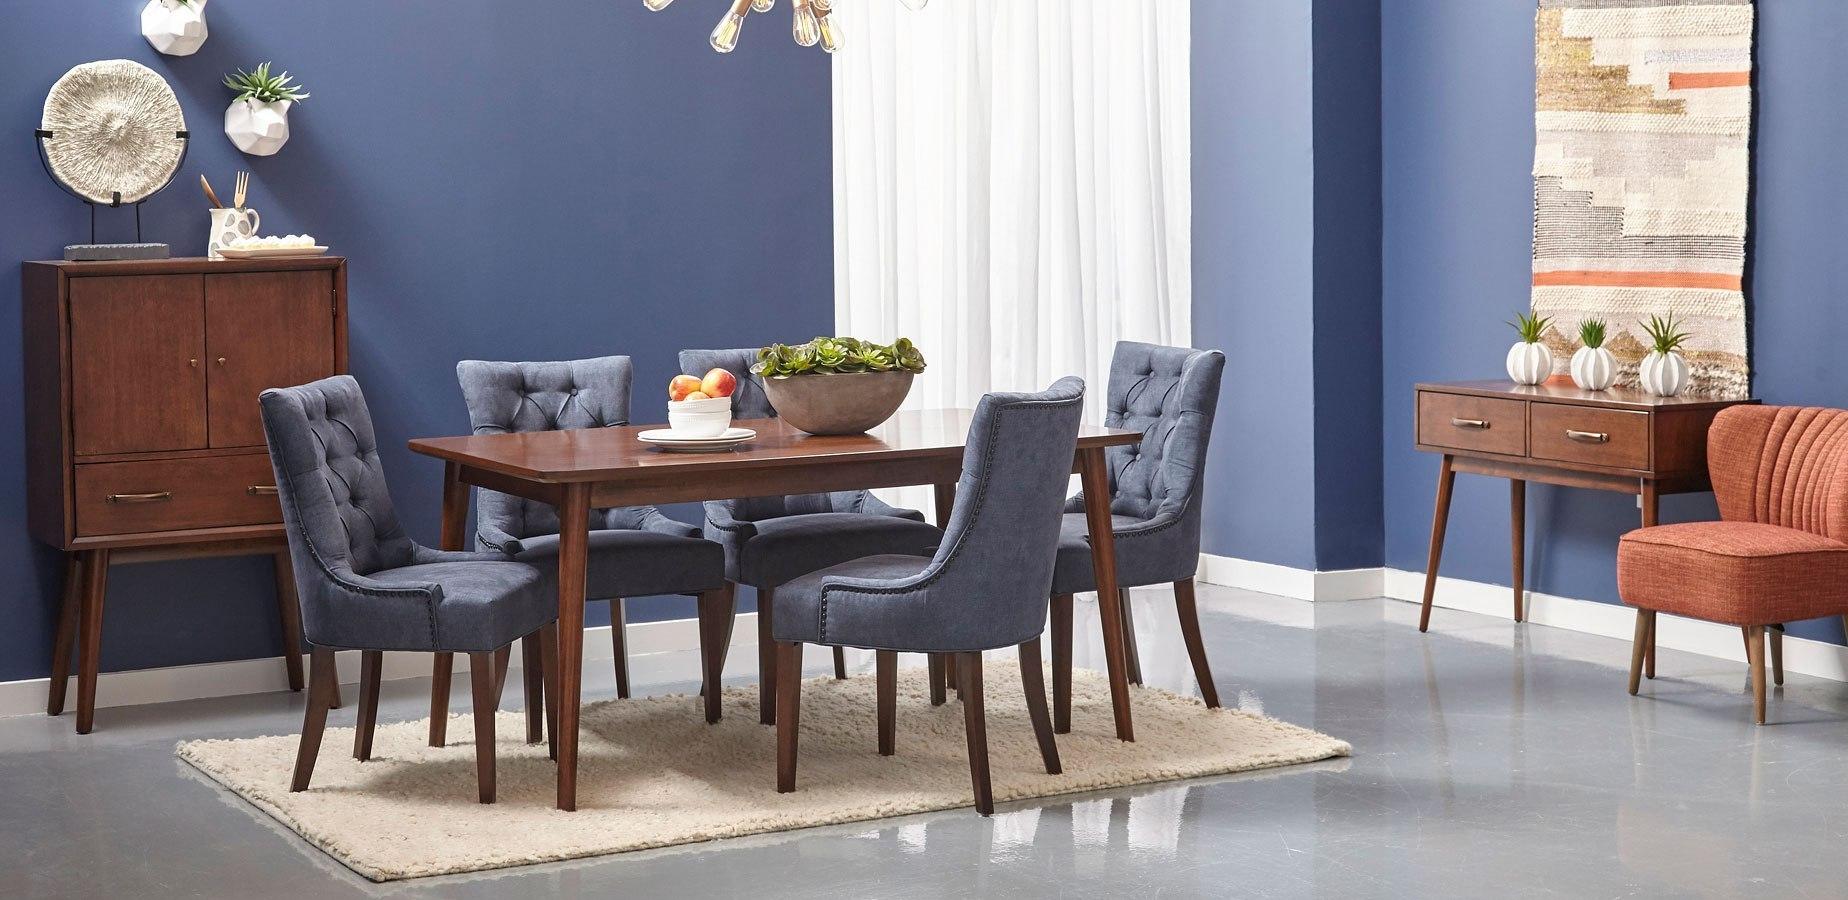 Attirant Draper Mid Century Modern Dining Room Set By Pulaski Furniture |  FurniturePick